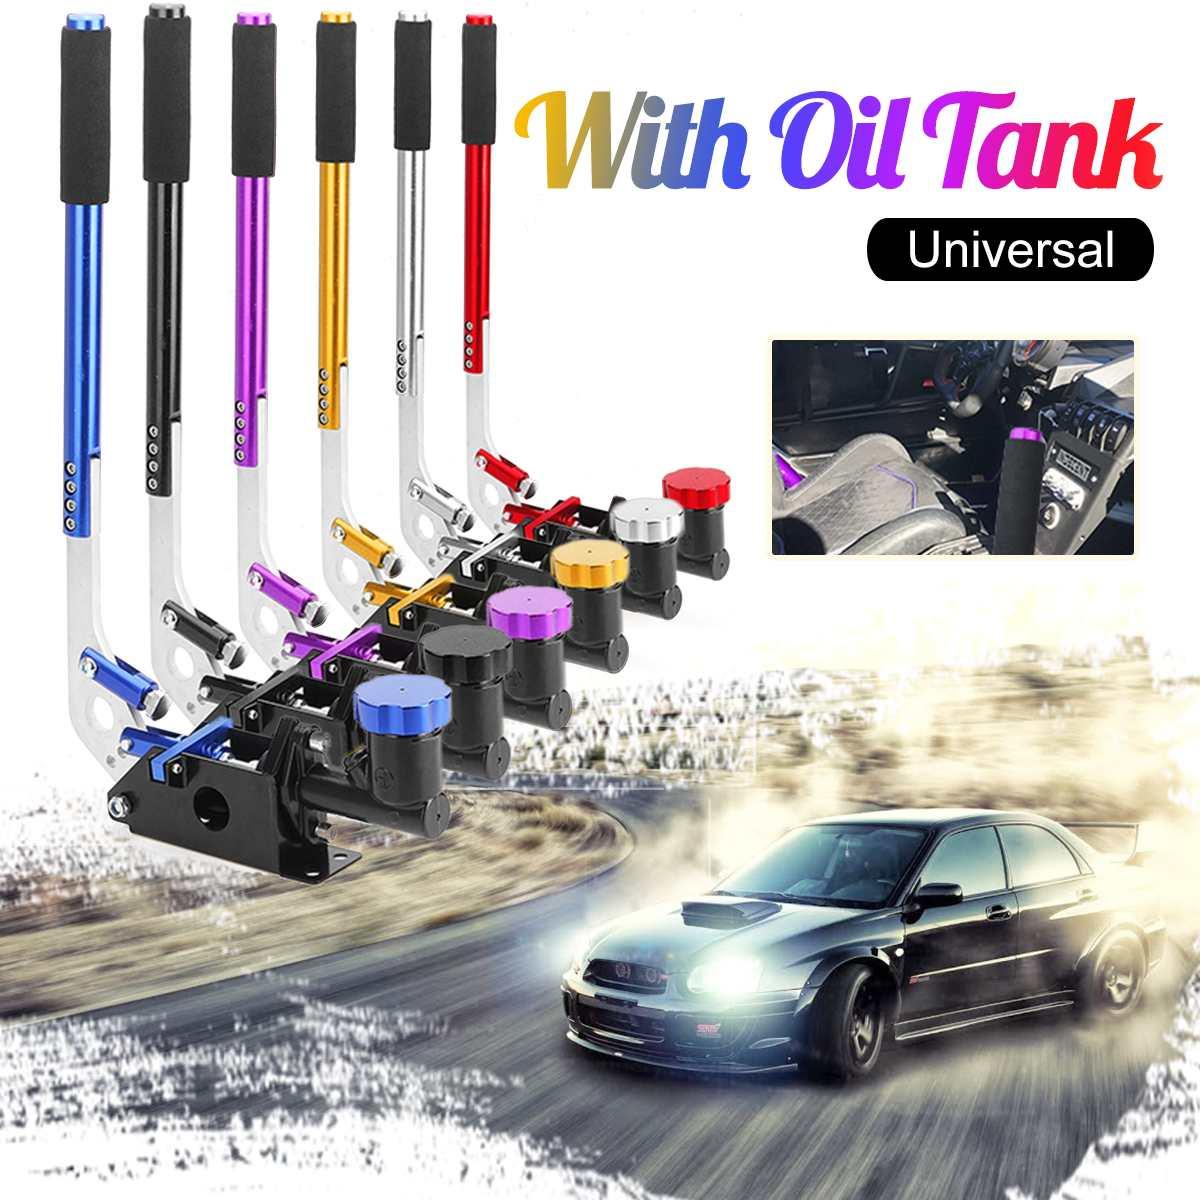 32.4cm Universal Long Vertical Hydraulic Handbrake Hydro E-brake Drift Race Hand Brake With Oil Tank